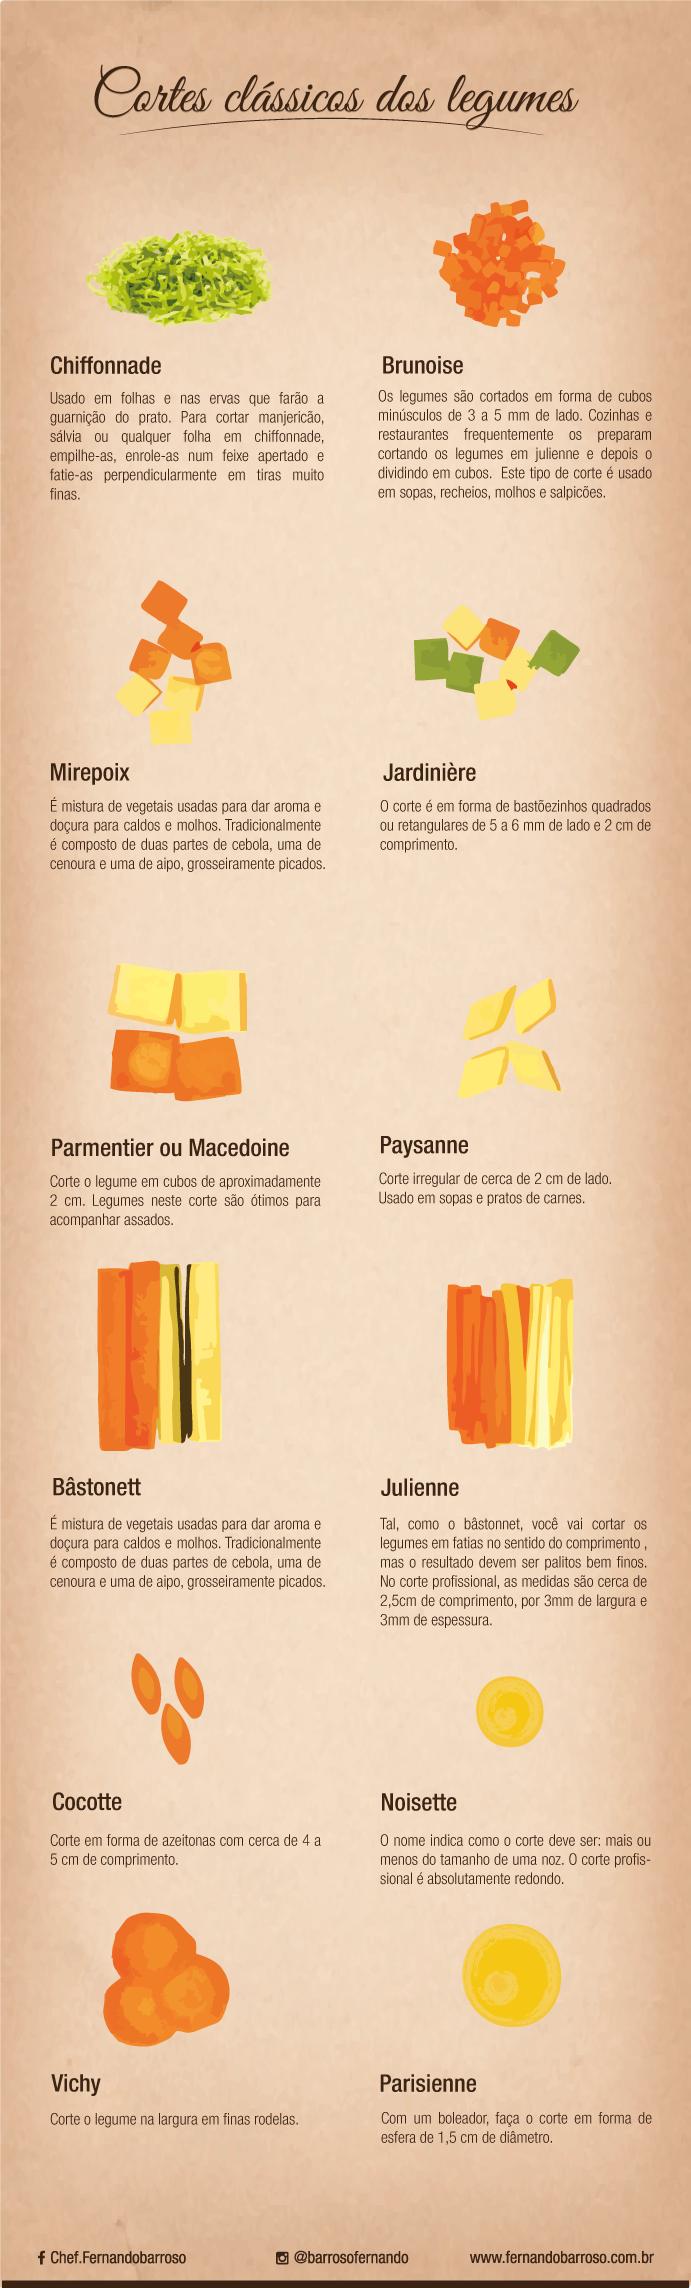 Cortes cl ssicos dos legumes fernando barroso for Cortes de verduras gastronomia pdf